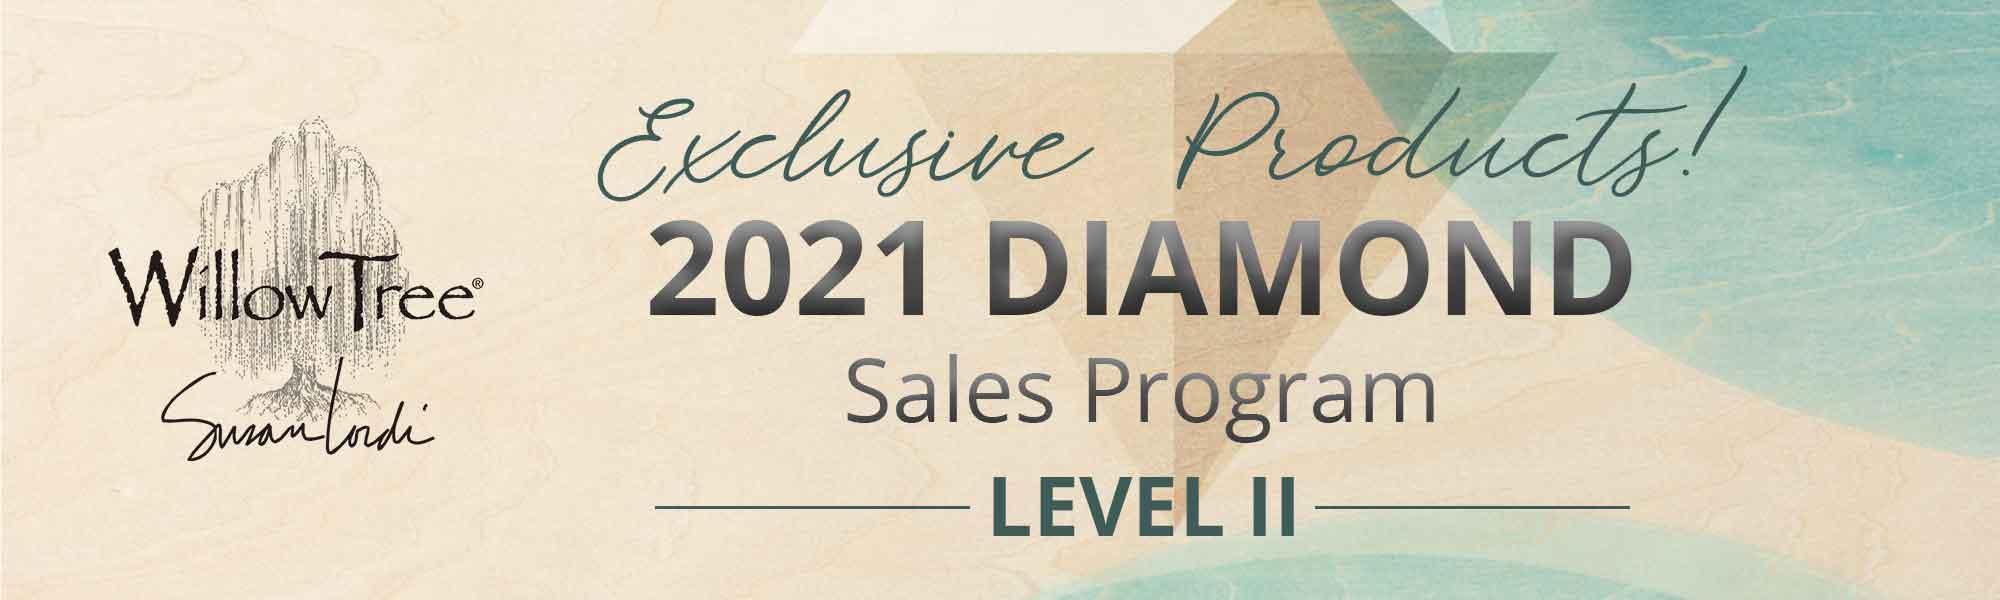 Exclusive Products. Willow Tree 2021 DIAMOND Sales Program Level II